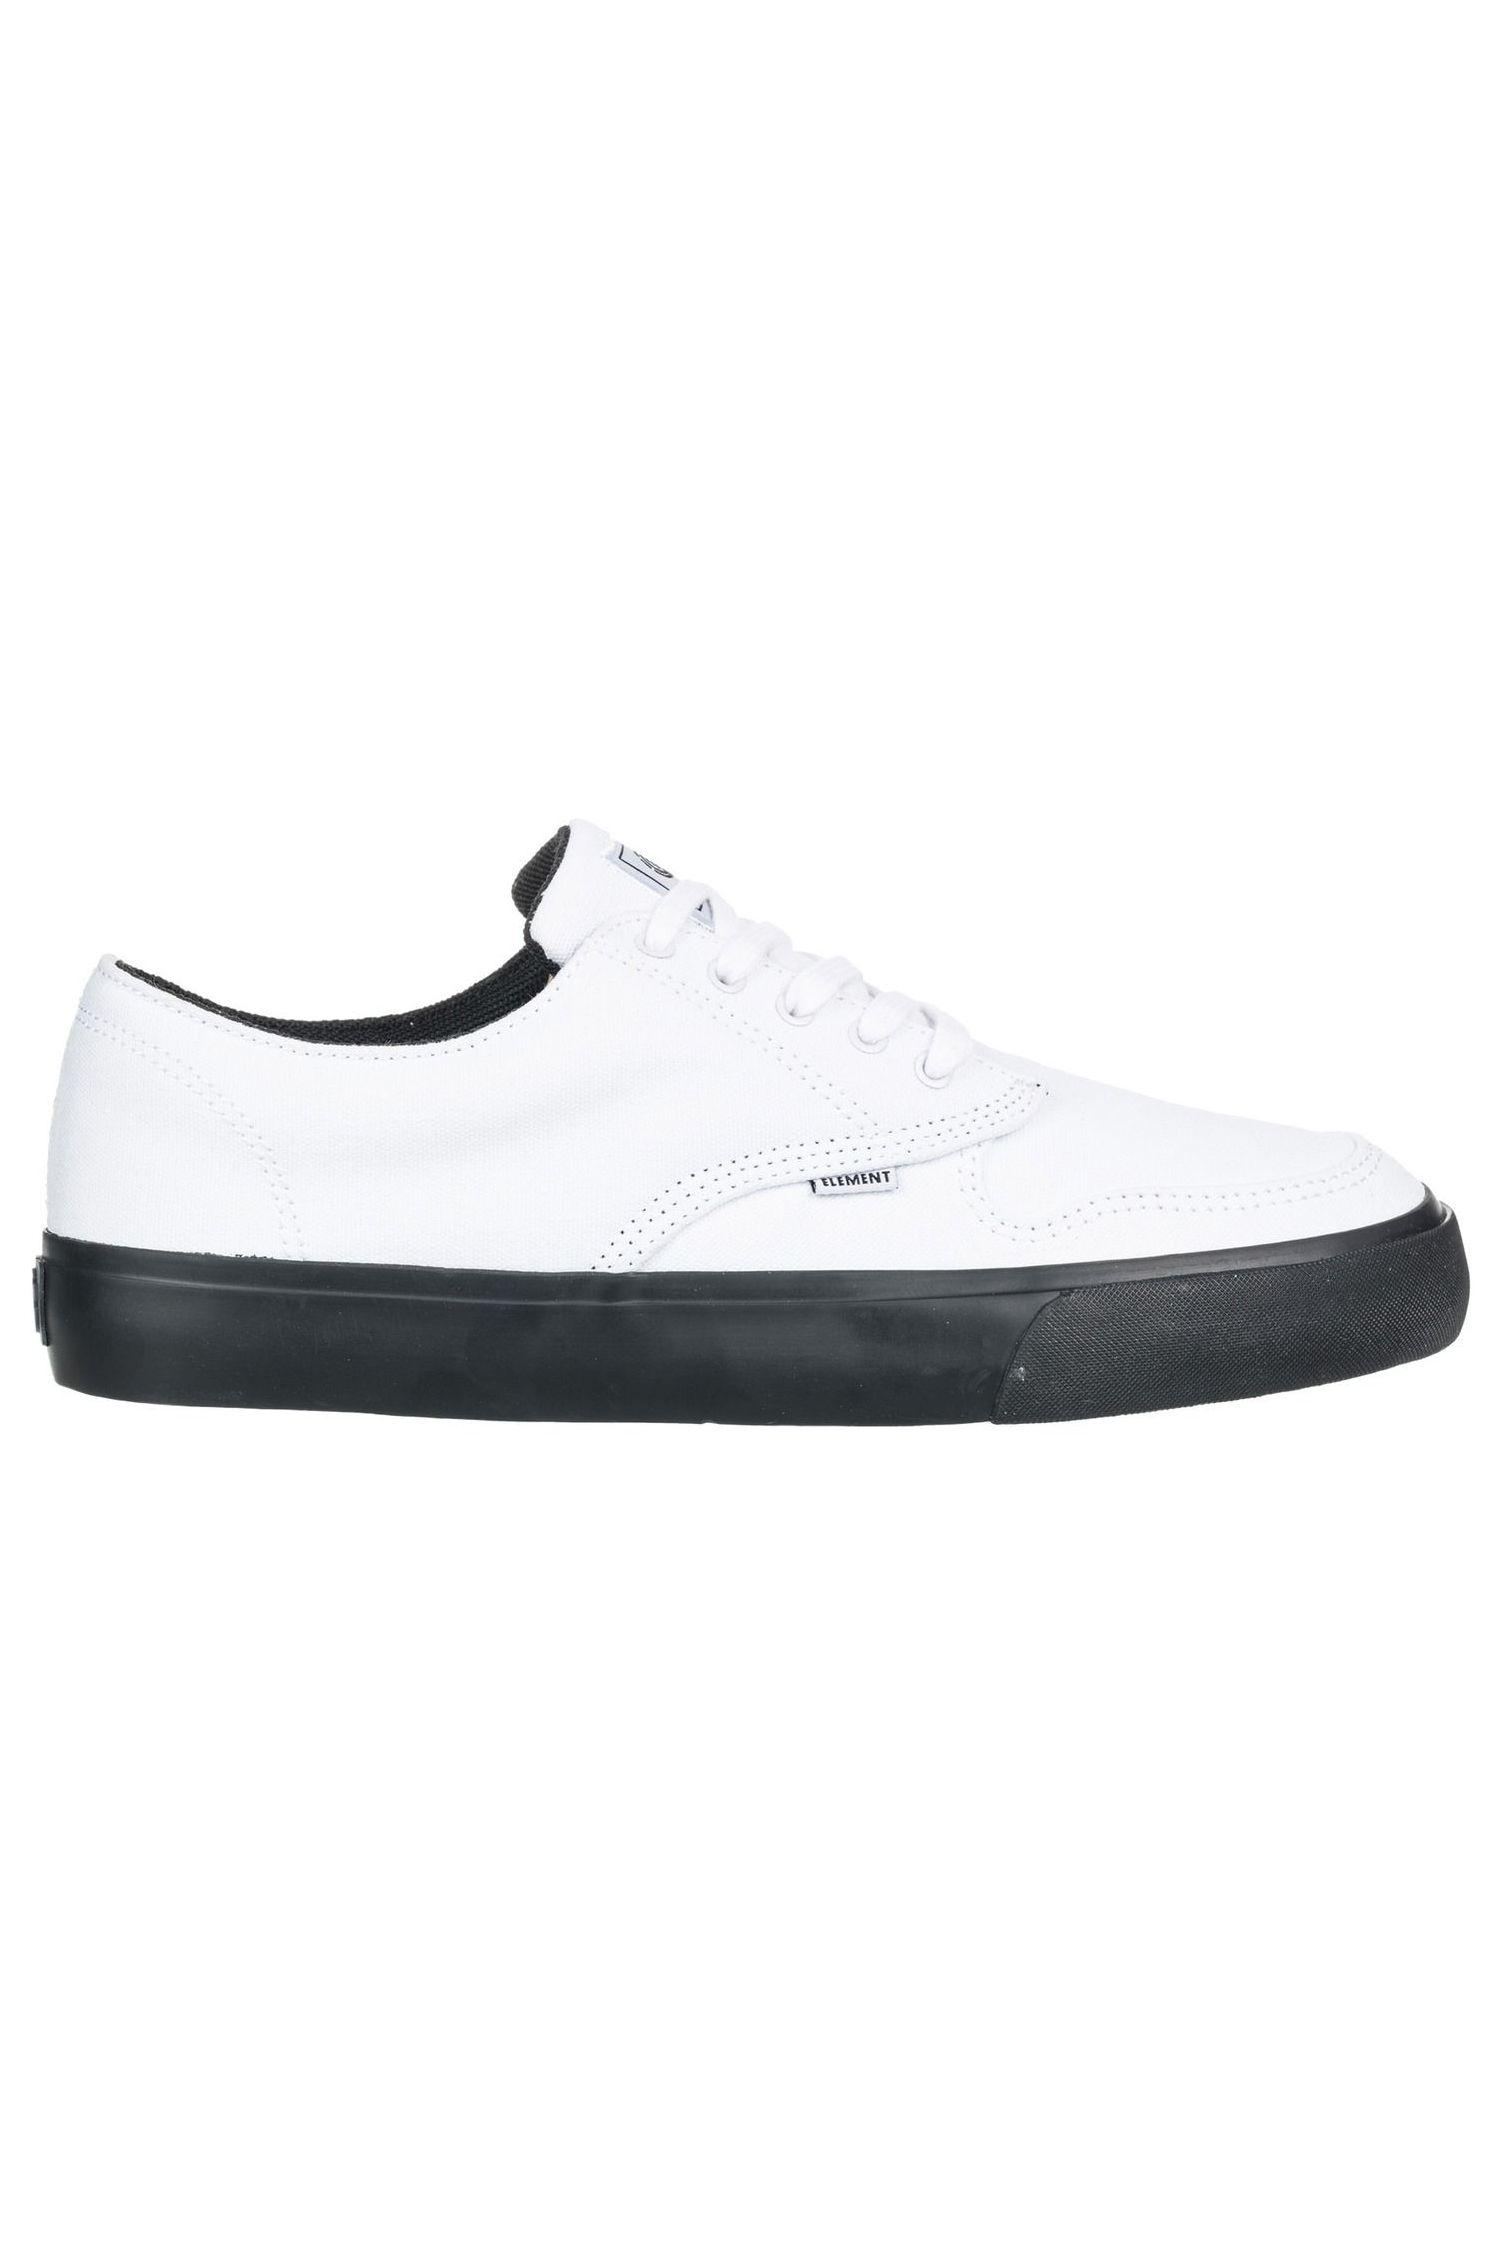 Element Shoes TOPAZ C3 White